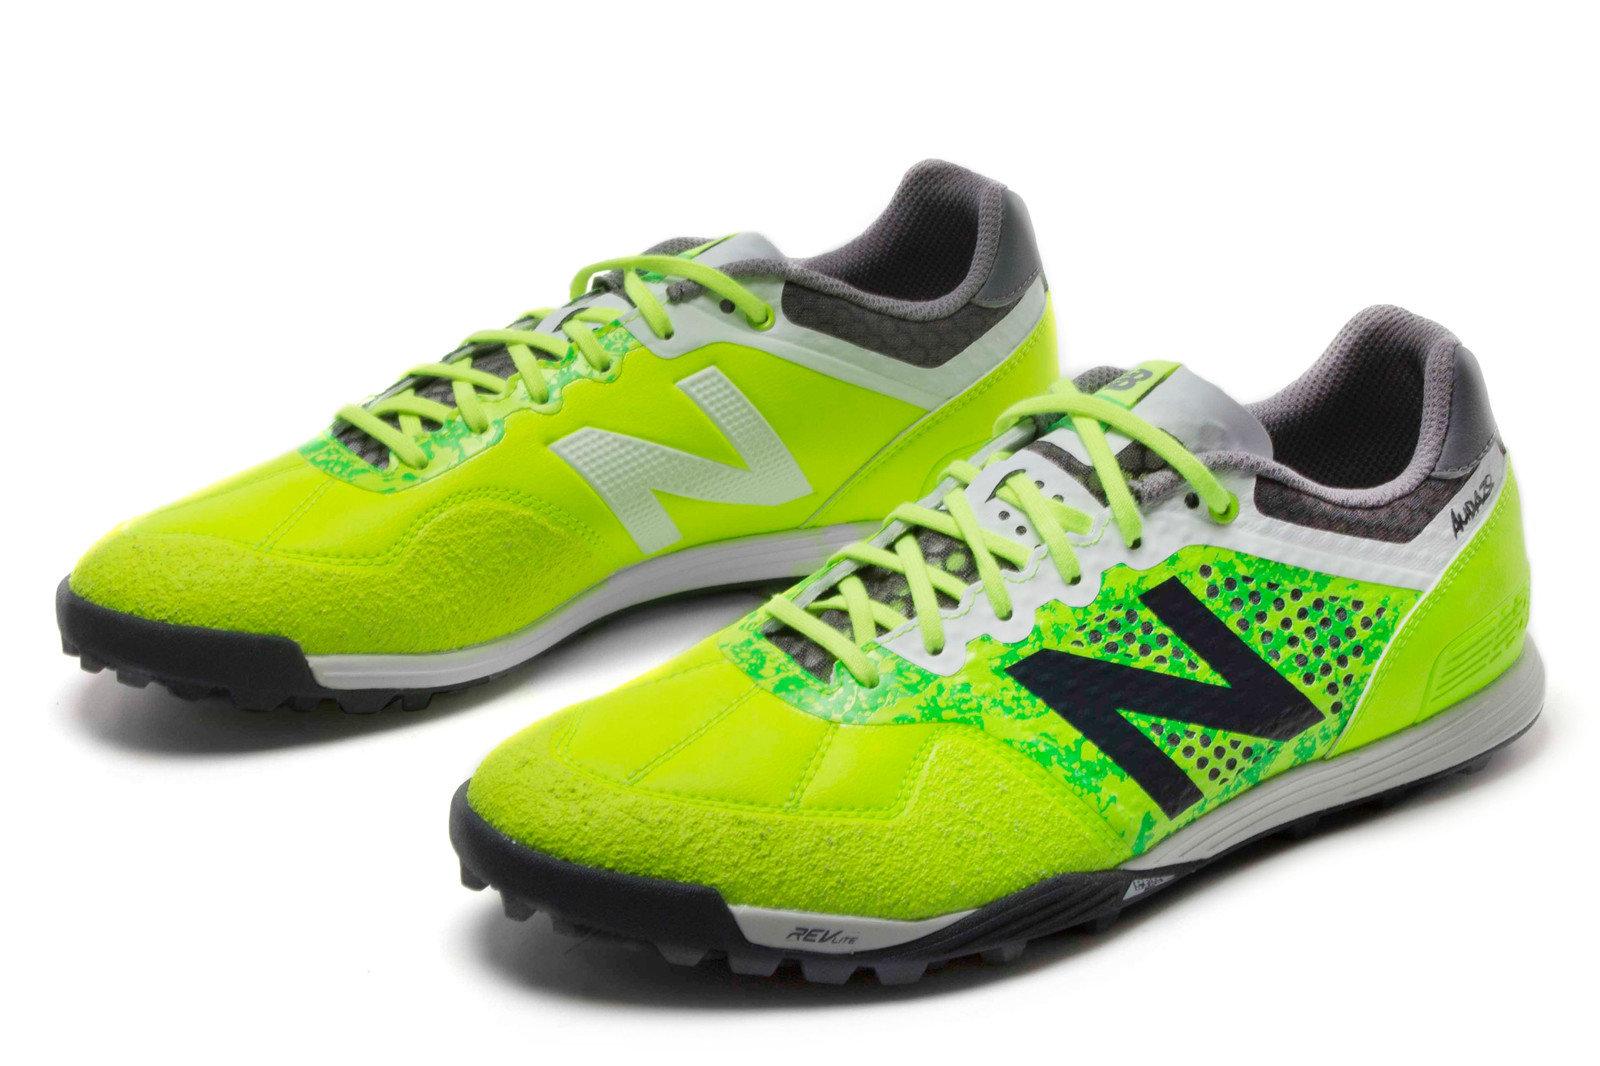 291f02f8ff5 New Balance Mens Audazo Pro Turf Football Trainers Shoes Training Sports  Wokout